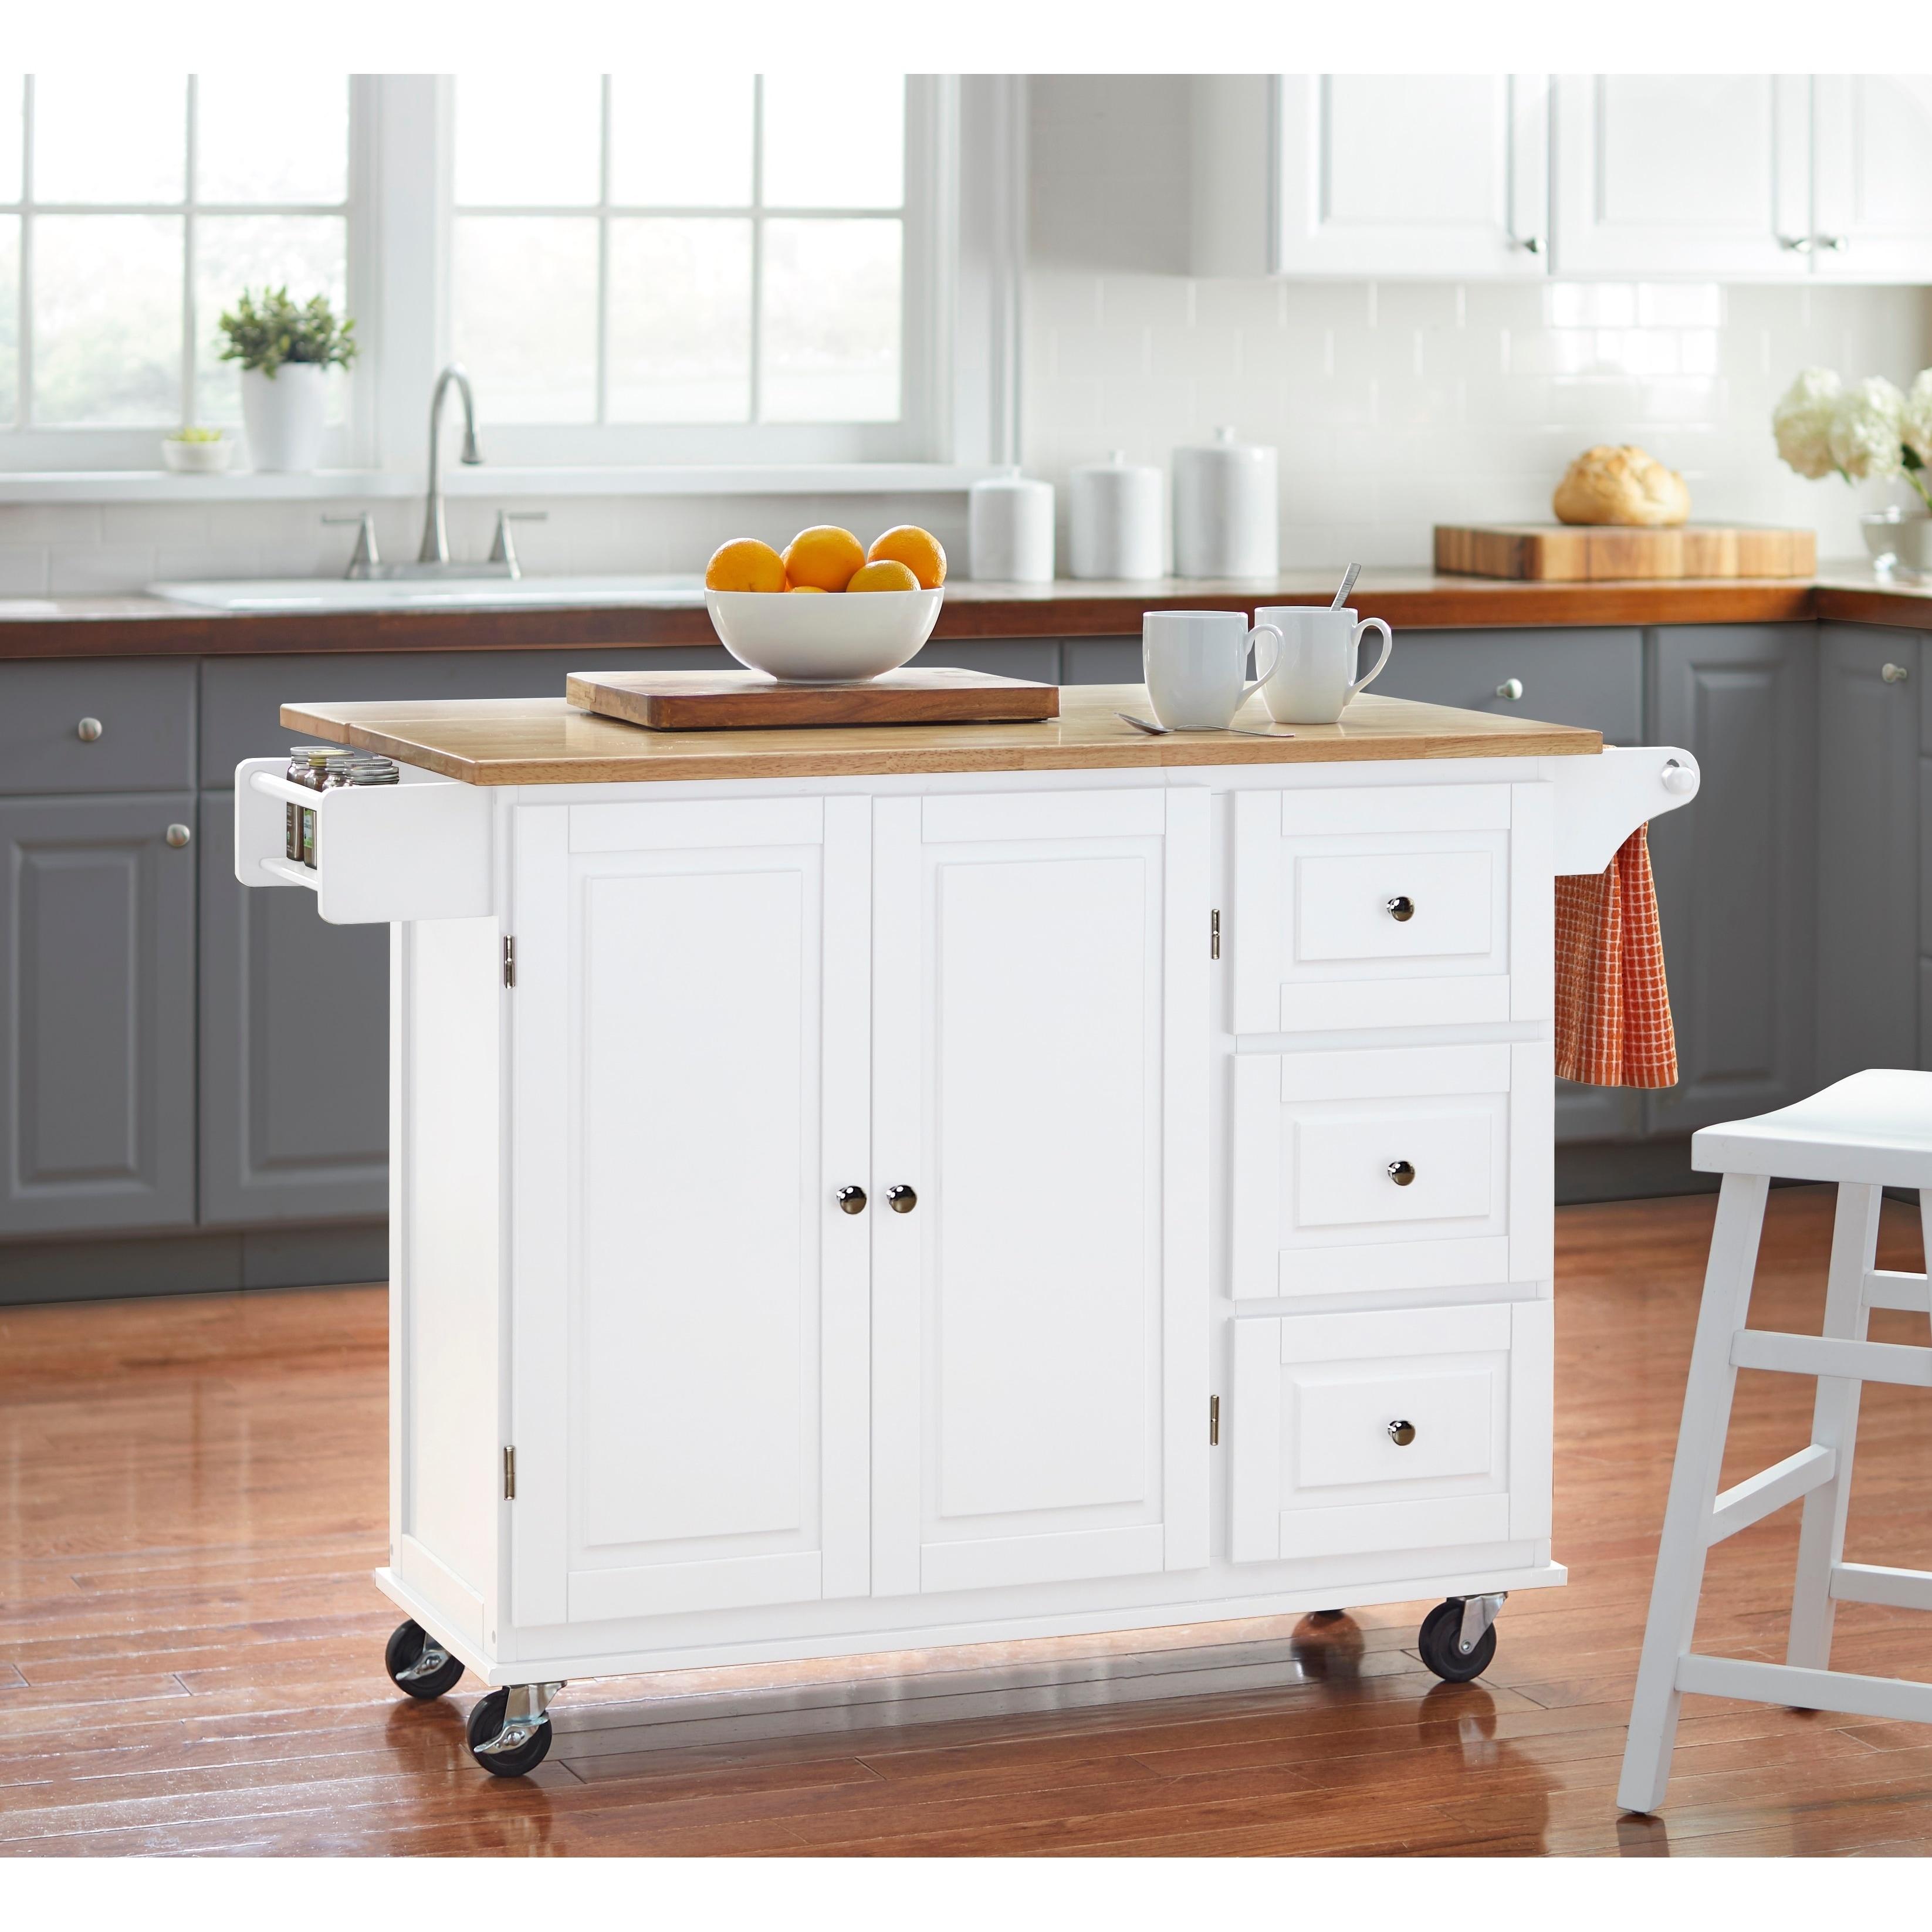 Overstock.com & Buy Kitchen Carts Online at Overstock | Our Best Kitchen Furniture Deals